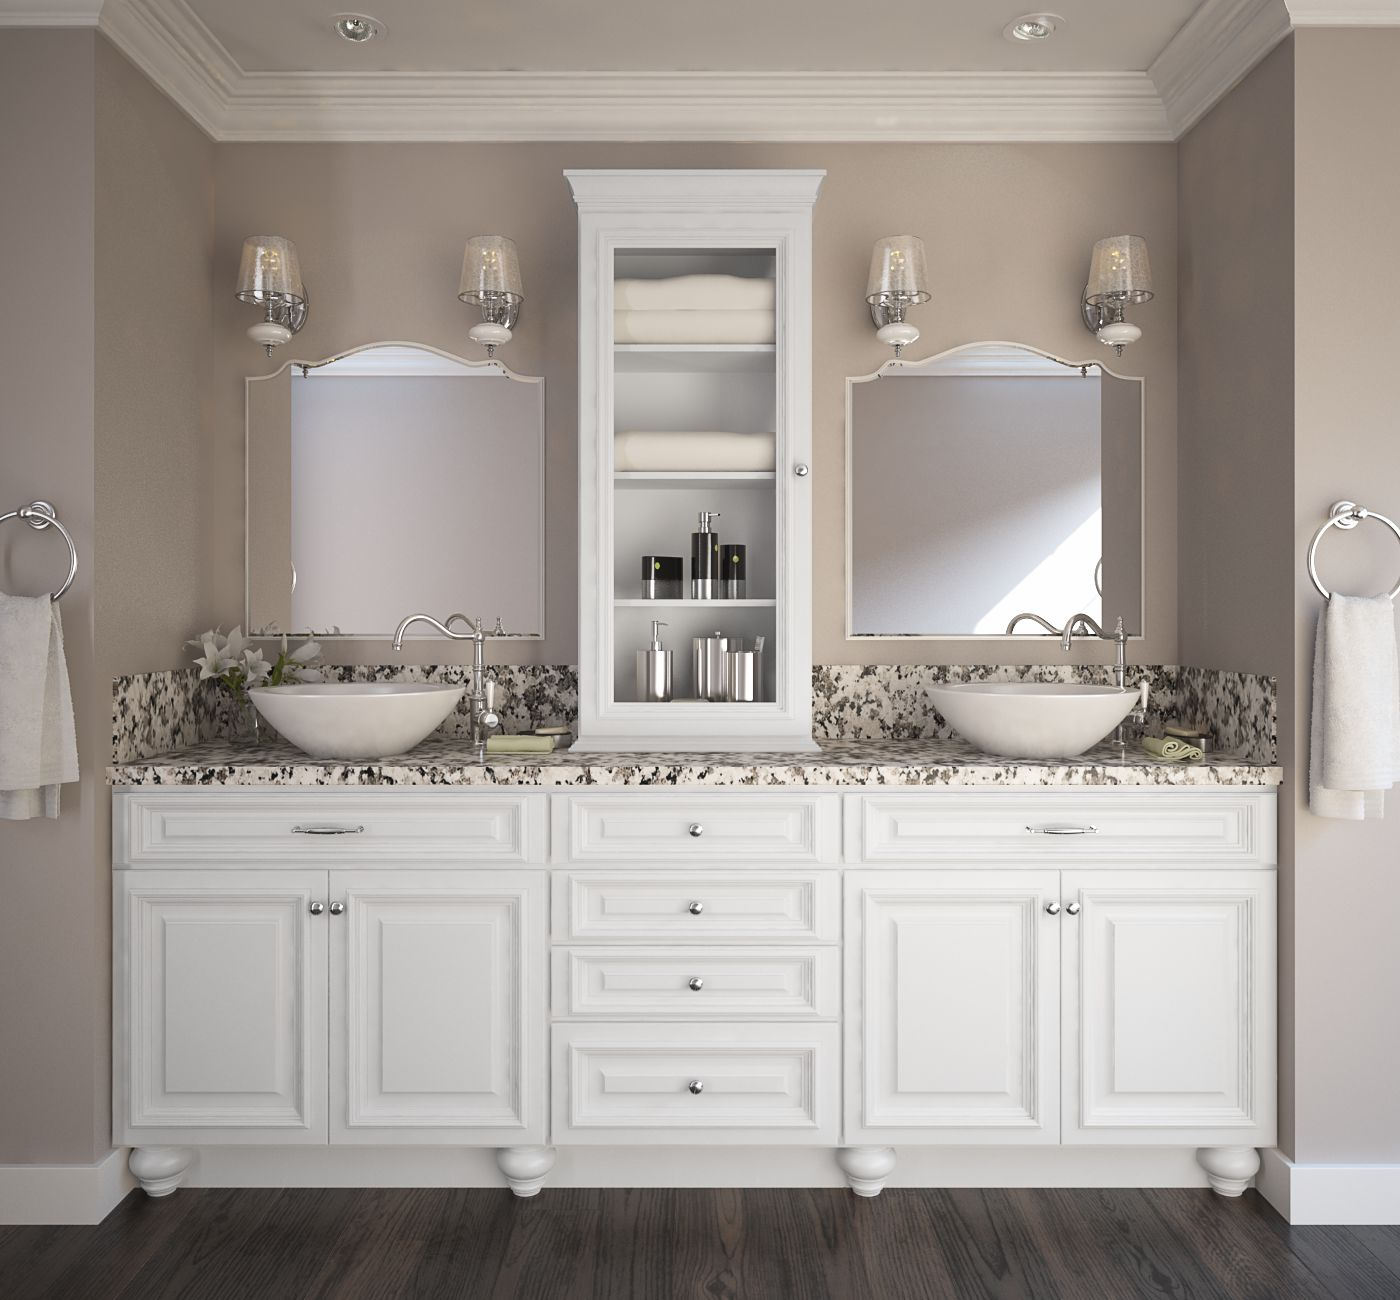 Preassembled Kitchen Cabinets: Semi Custom Roosevelt White Pre-Assembled Kitchen Cabinets